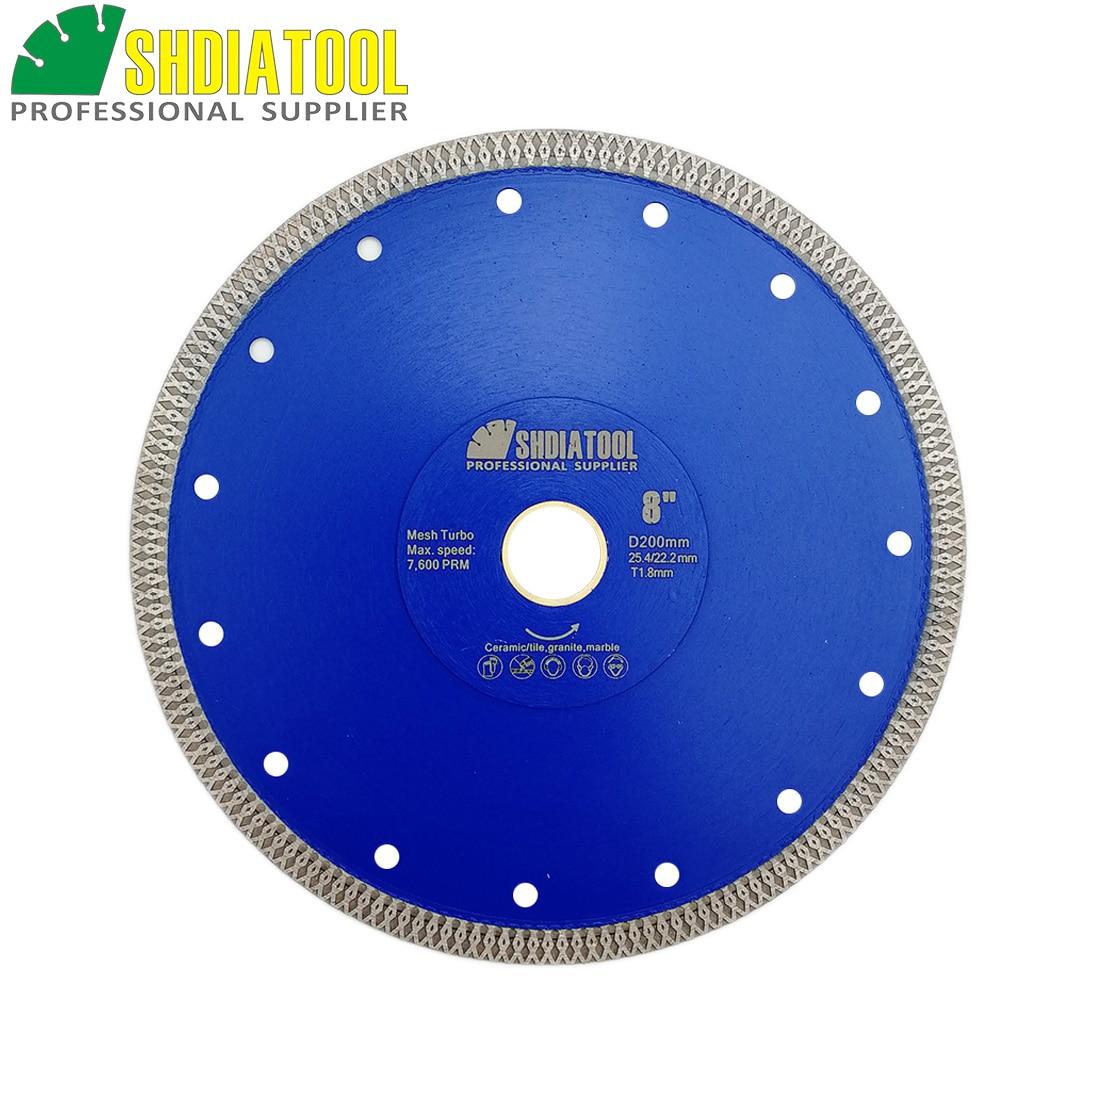 "SHDIATOOL 1pc Dia 8""/200mm Hot pressed sintered X Mesh Turbo Diamond Saw blade circular Wheel Cutting Disc Marble Tile Ceramic"